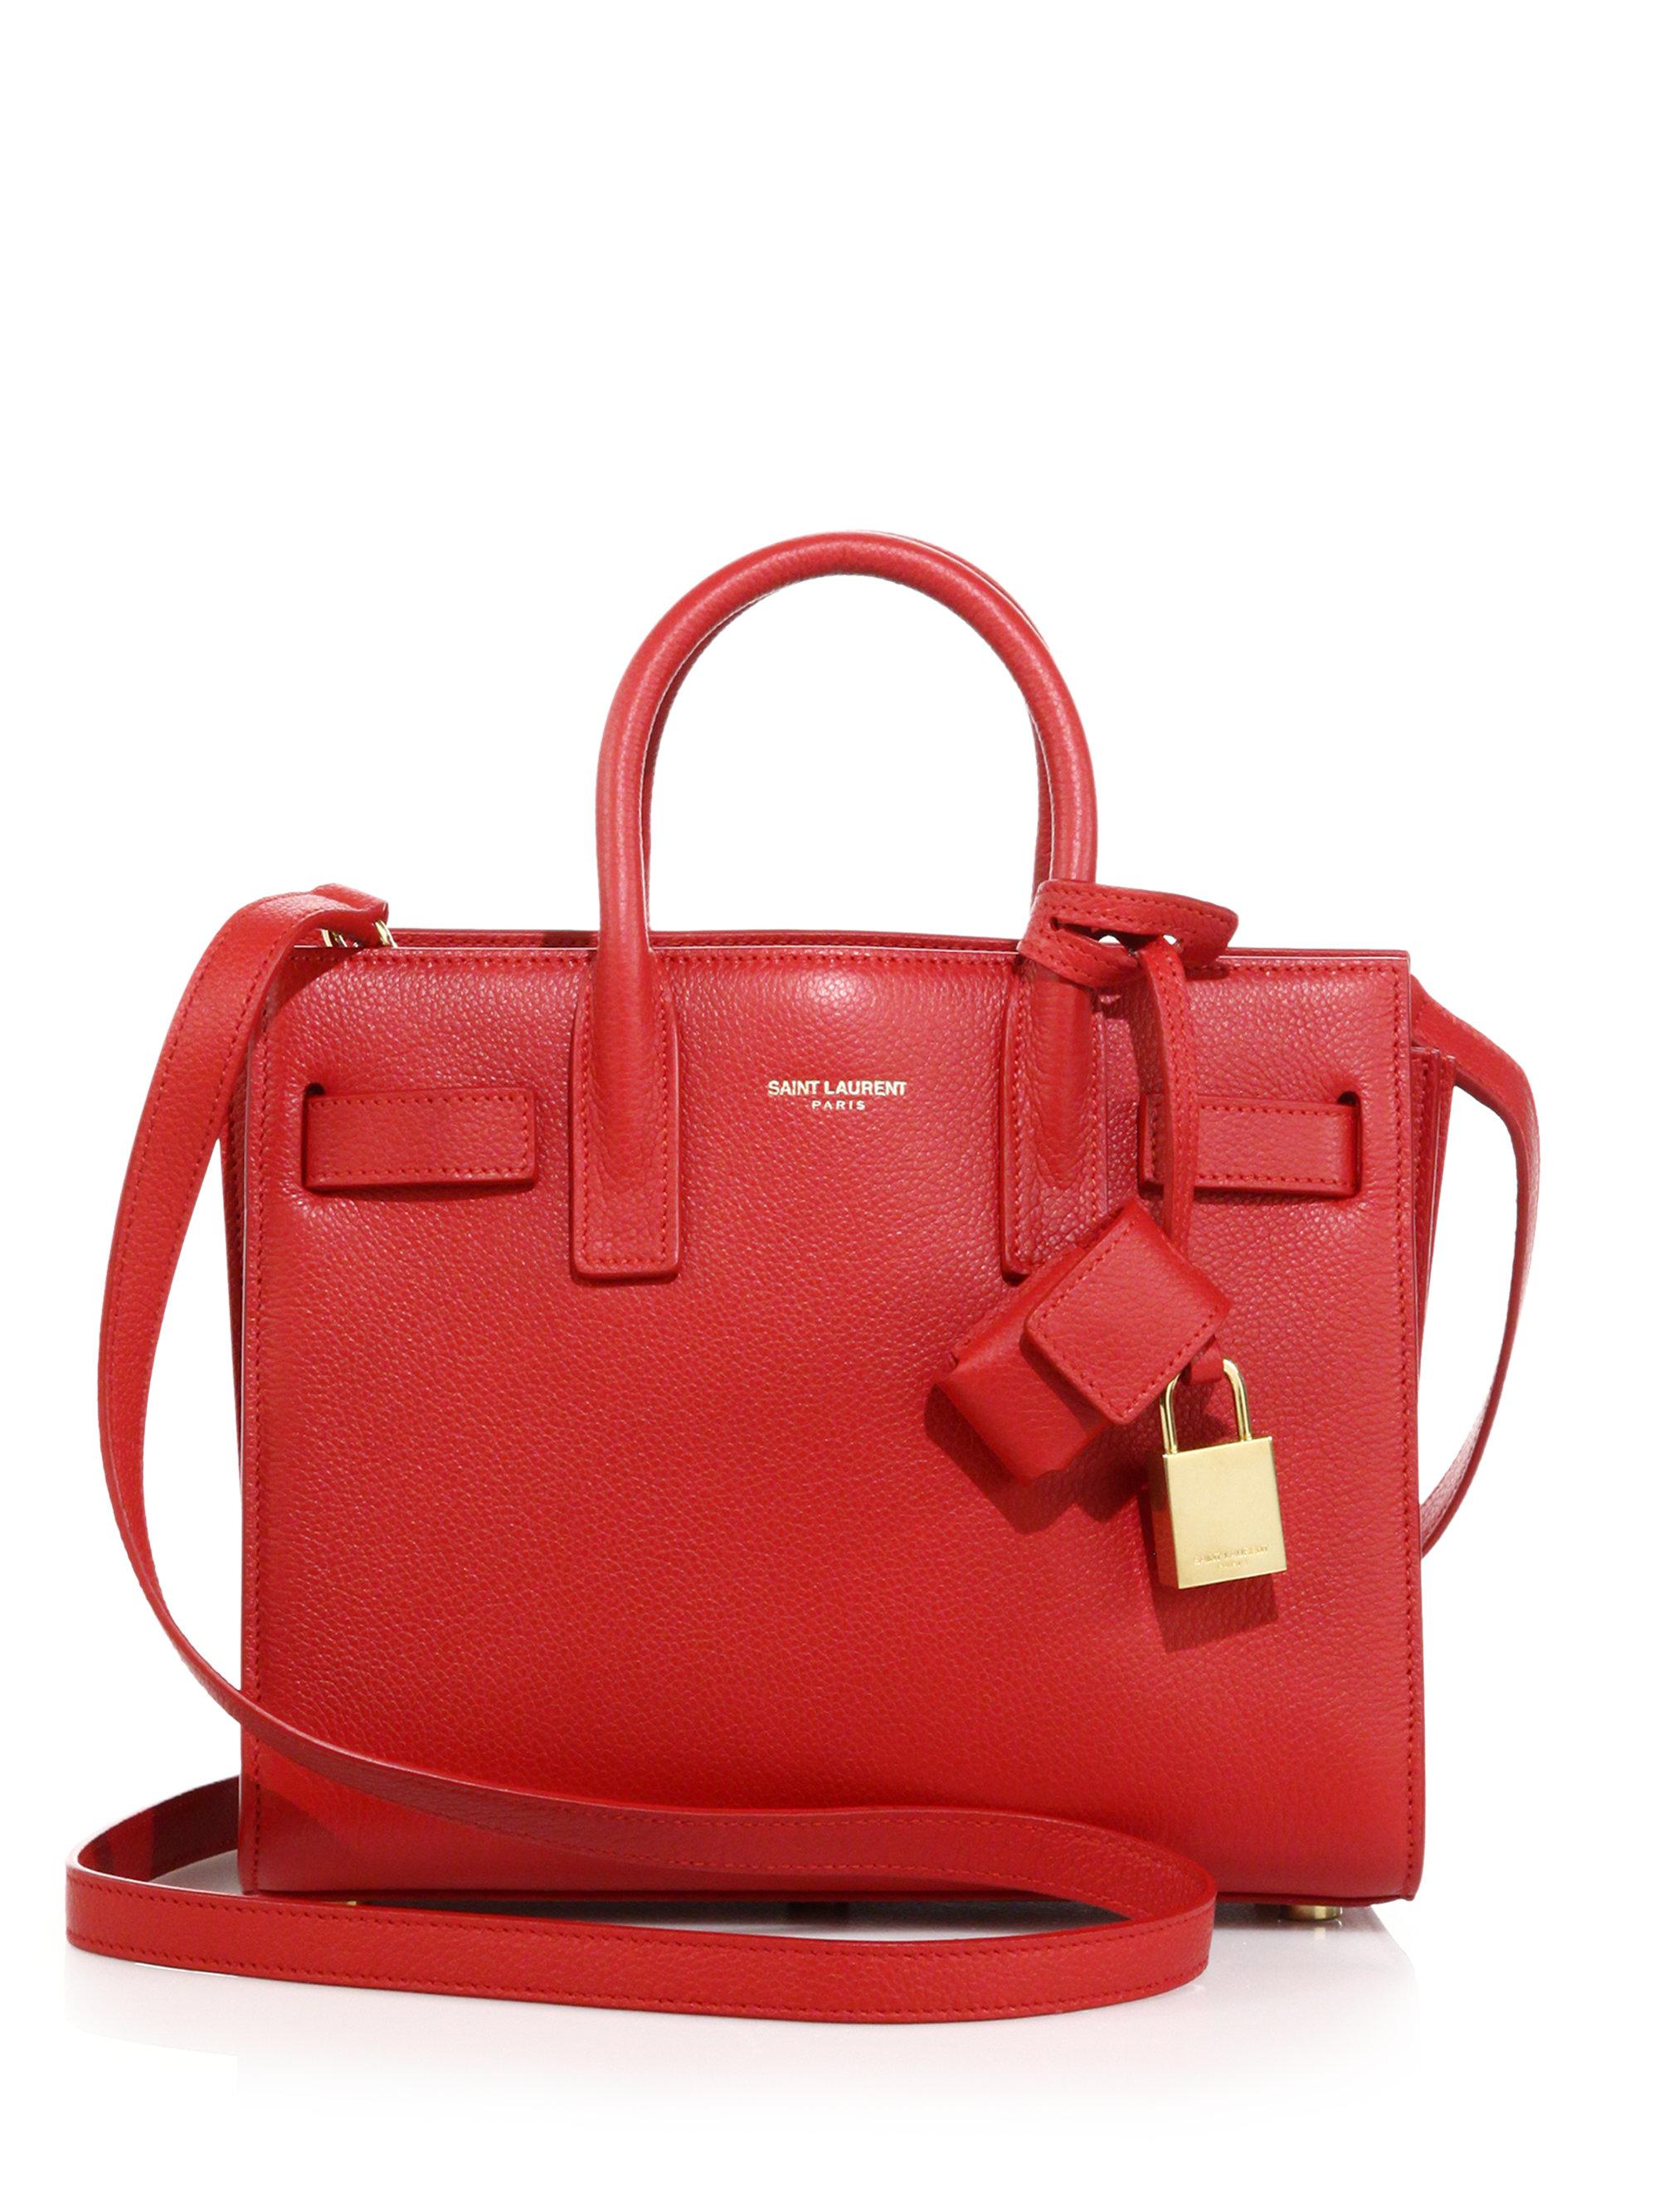 iv sen loren bags - sac de jour crocodile-stamped satchel bag, red